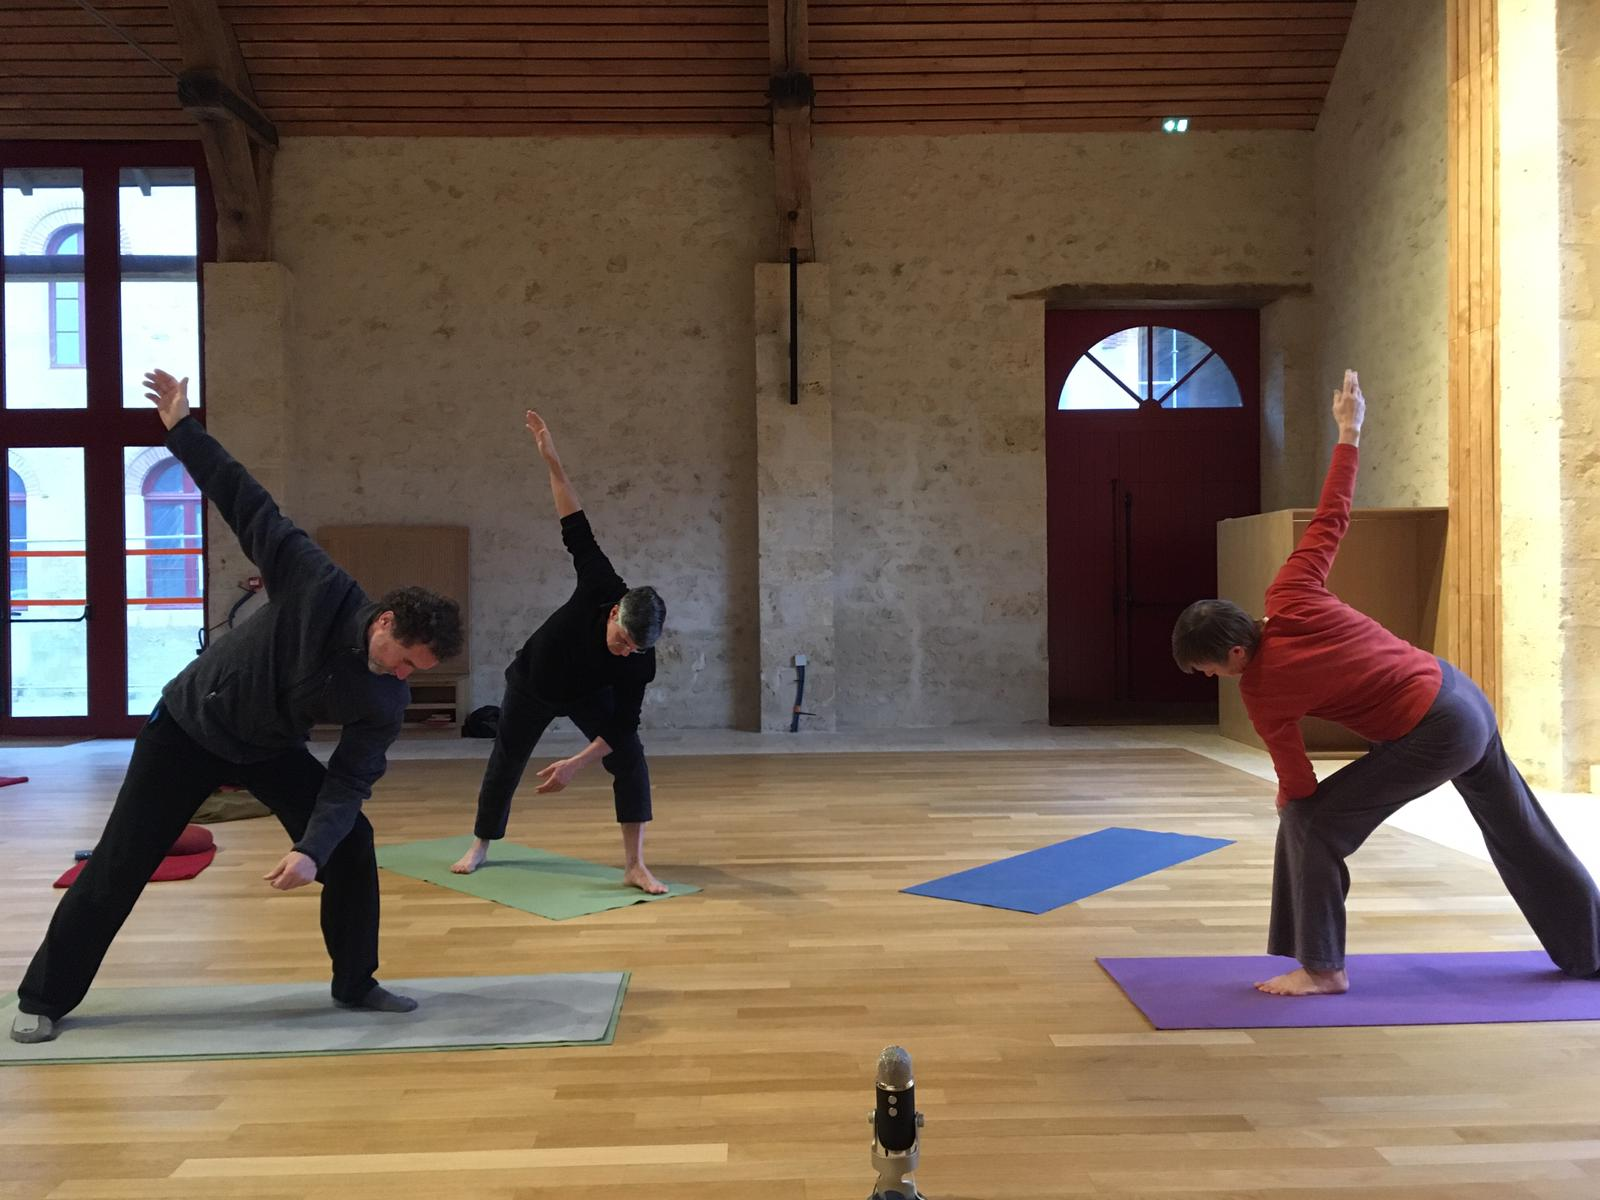 Yoga session at Bonnevaux